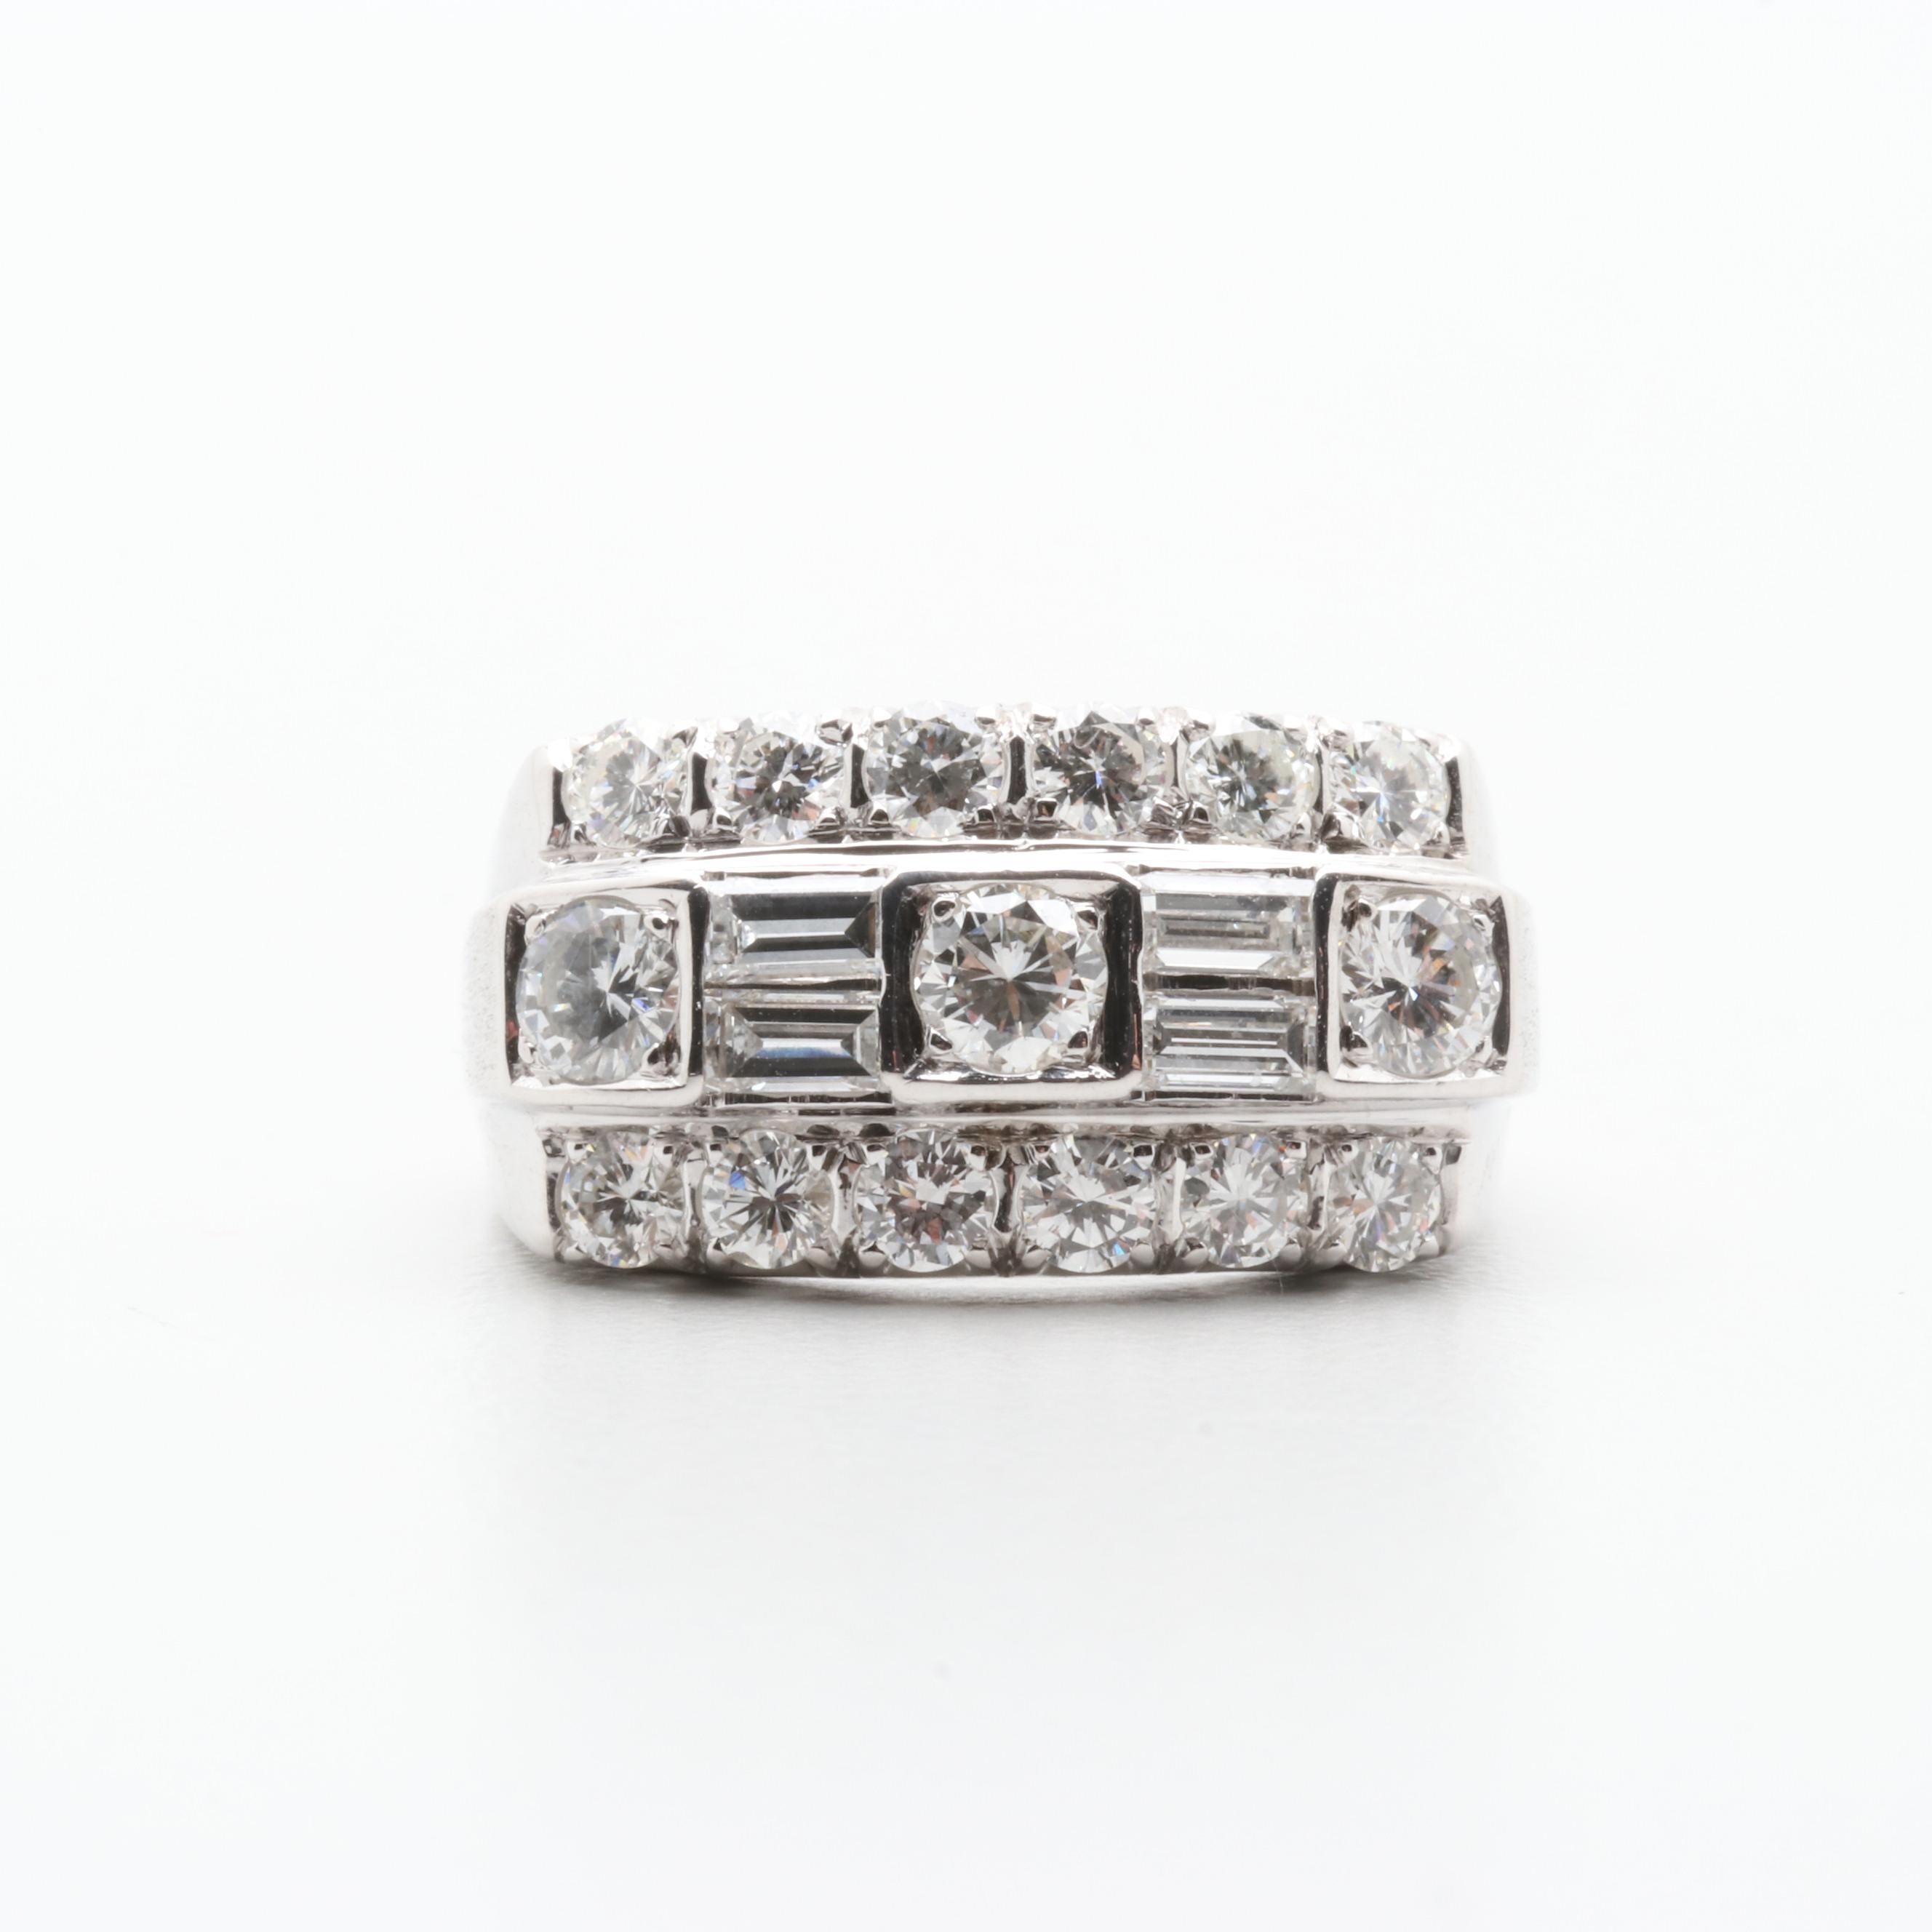 14K White Gold 1.62 CTW Diamond Ring